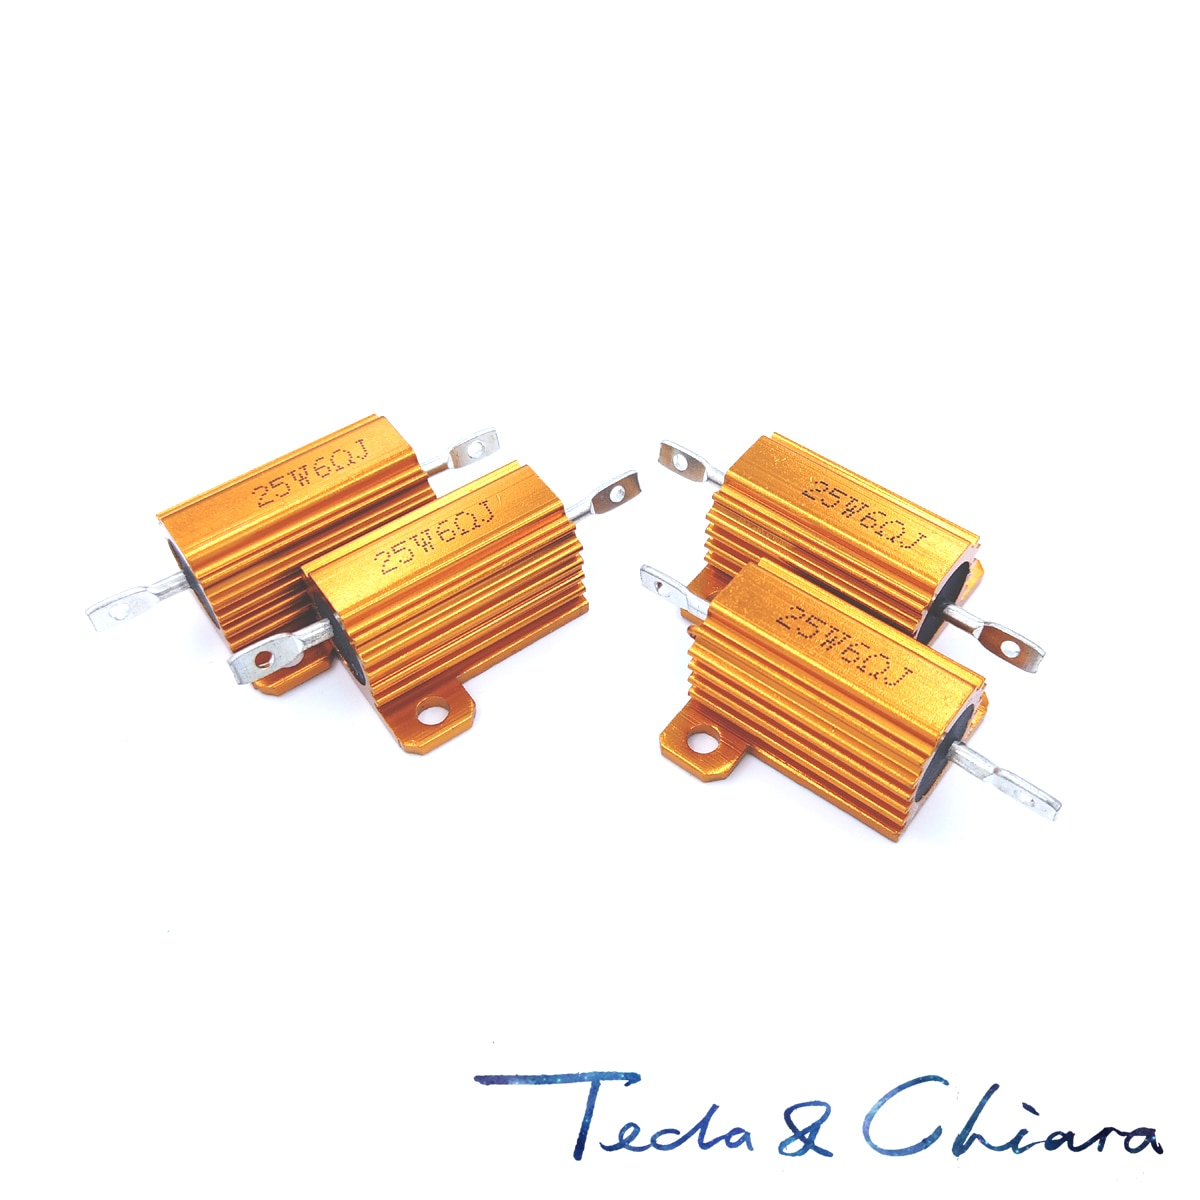 0.1r 0.1ohm 0.1 0.22r 0.22ohm 0.22 r ohm 25 w watt wirewound alumínio potência metal escudo caso resistência resistor rx24